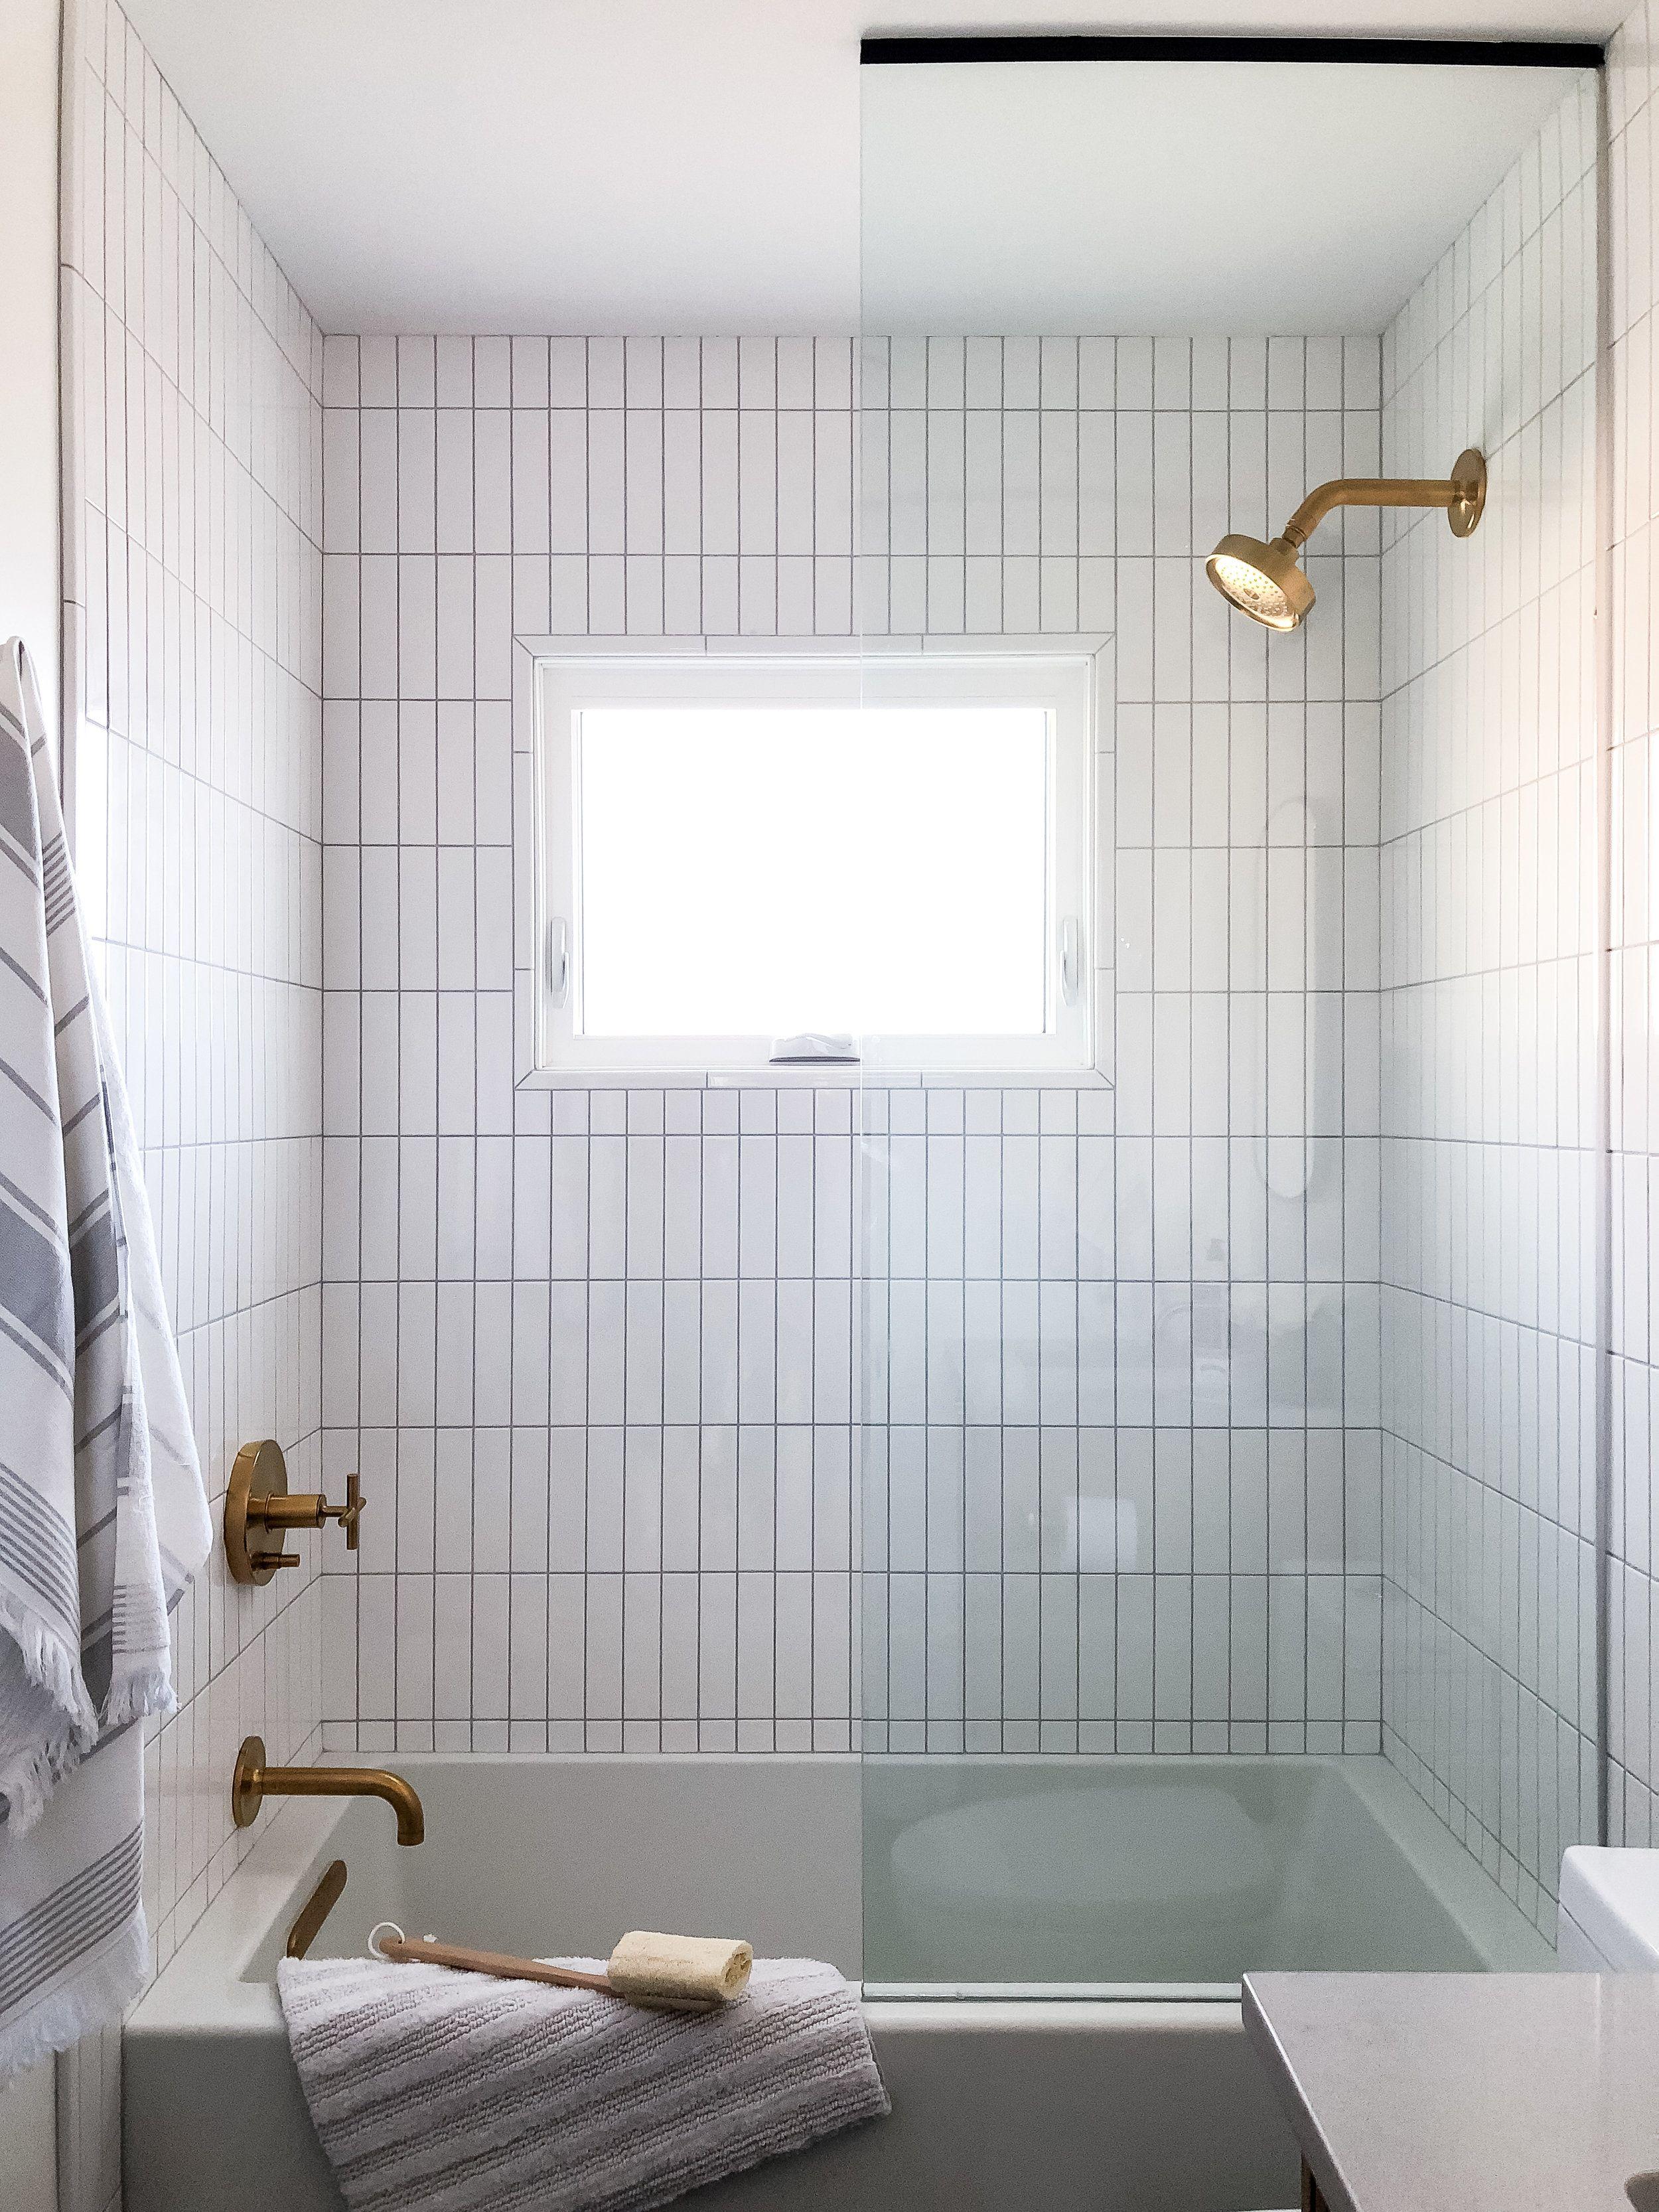 Bathroom Design With White Vertical Subway Tiles White Bathroom